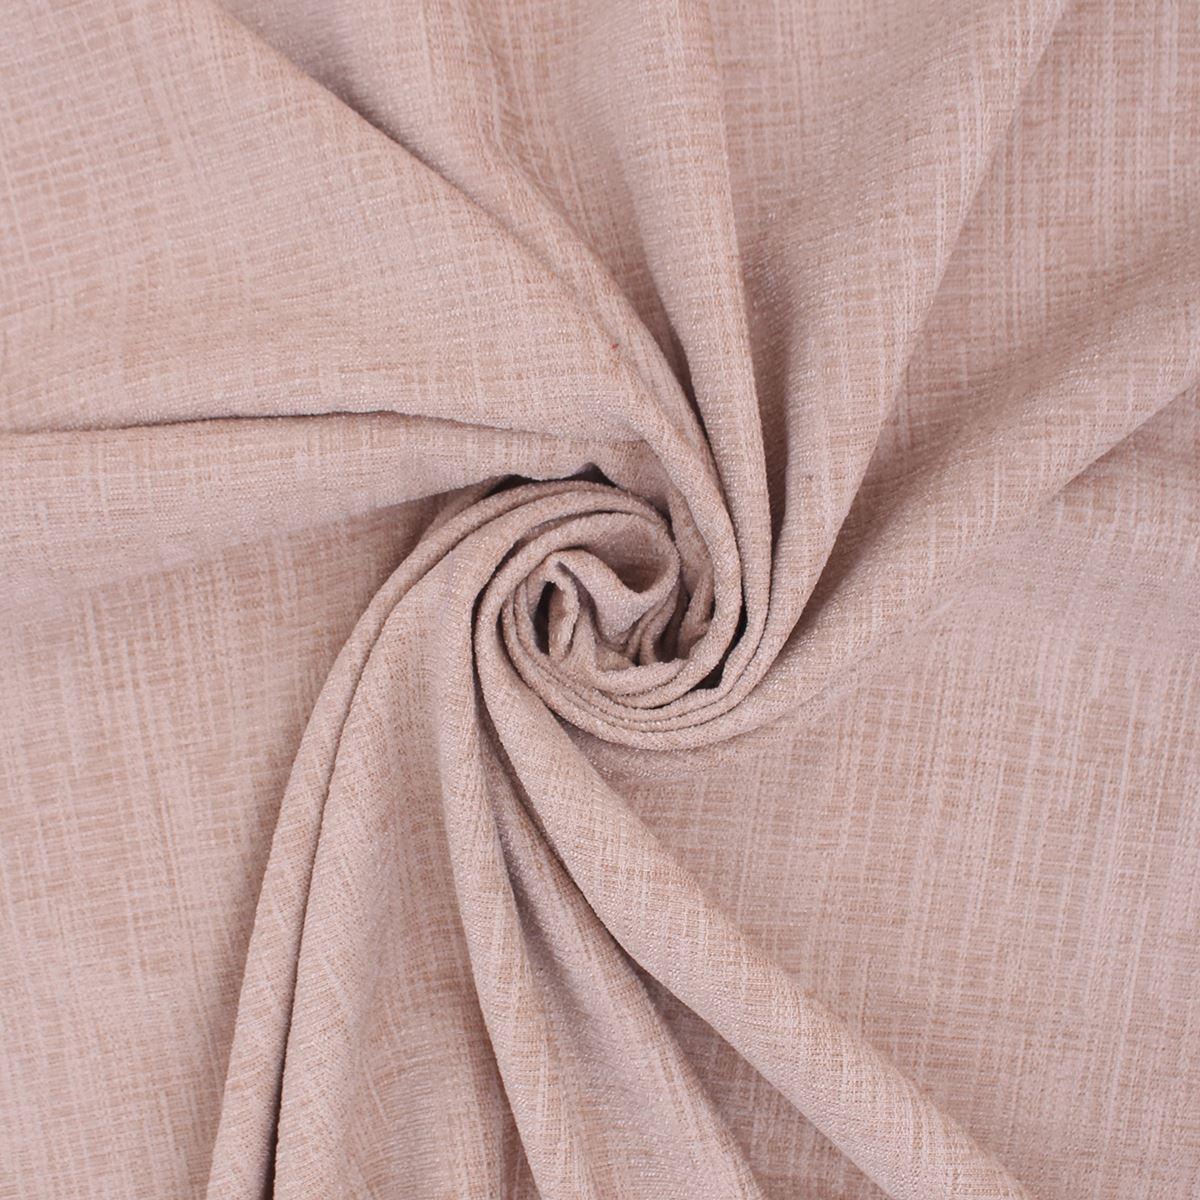 034-Chenille-034-Slubbed-Shabby-Worn-Look-Curtain-Cushion-Sofa-Upholstery-Fabric thumbnail 46